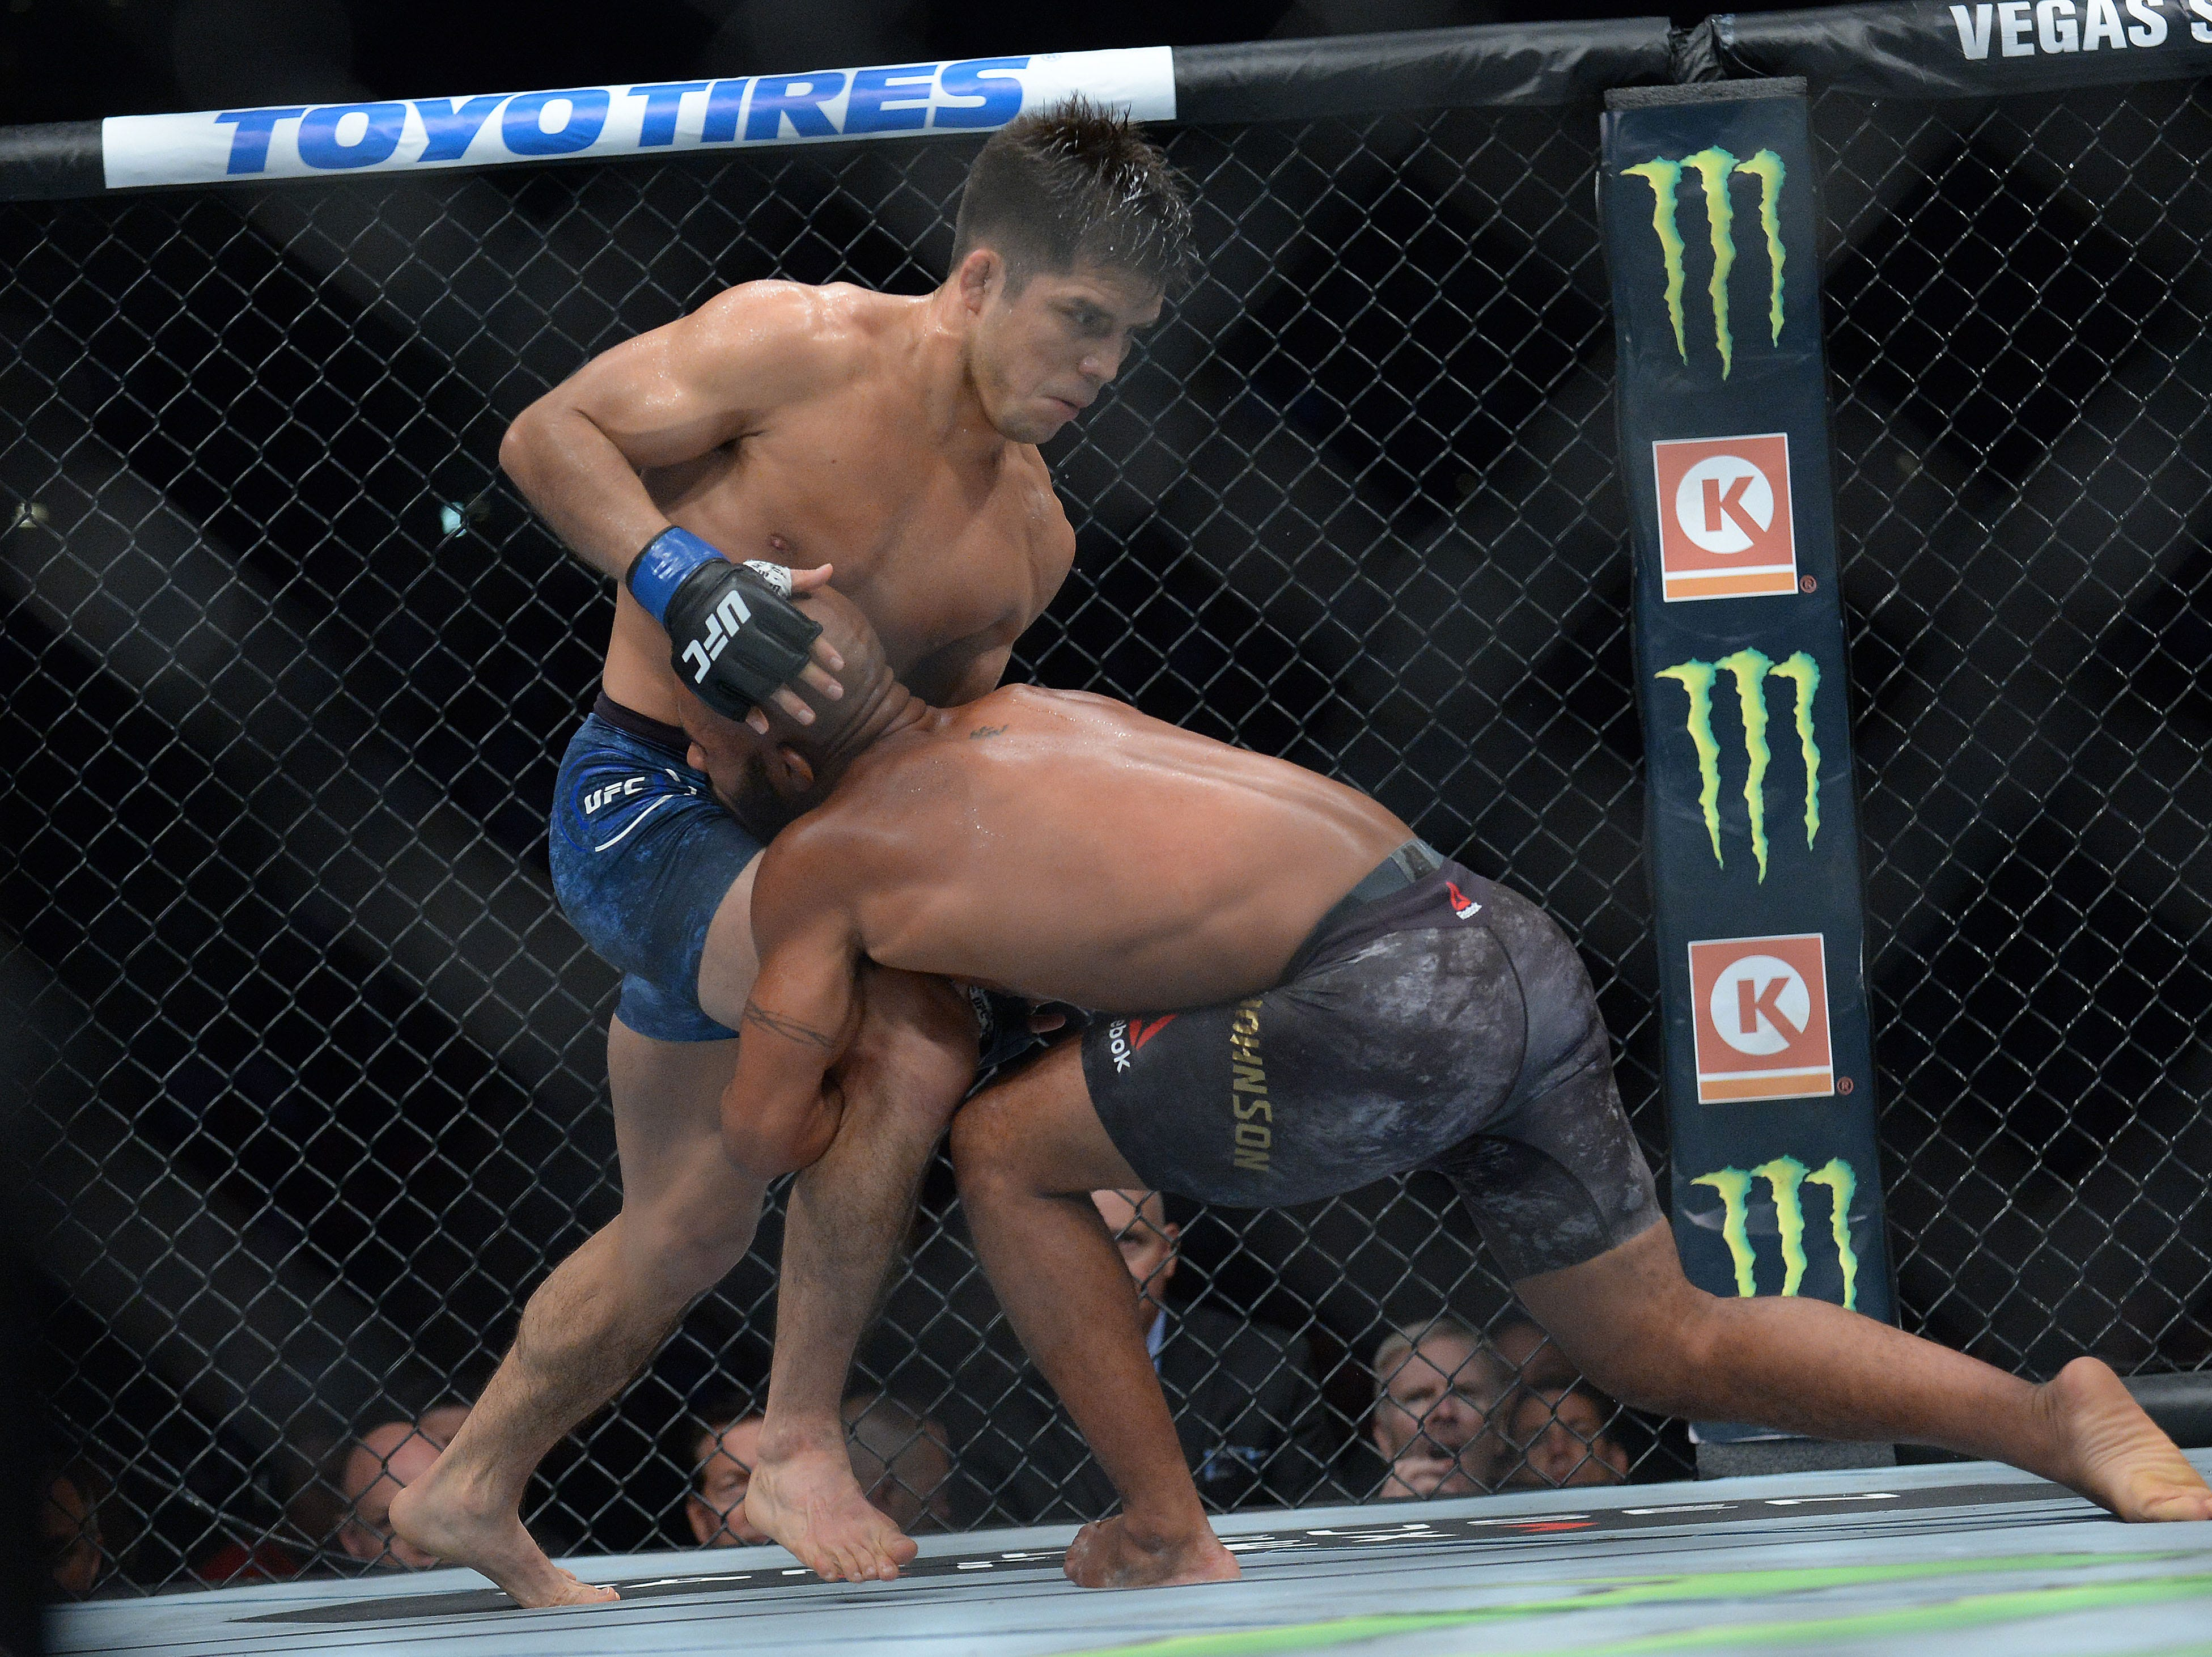 Demetrious Johnson moves in against Henry Cejudo during UFC 227 at Staples Center.